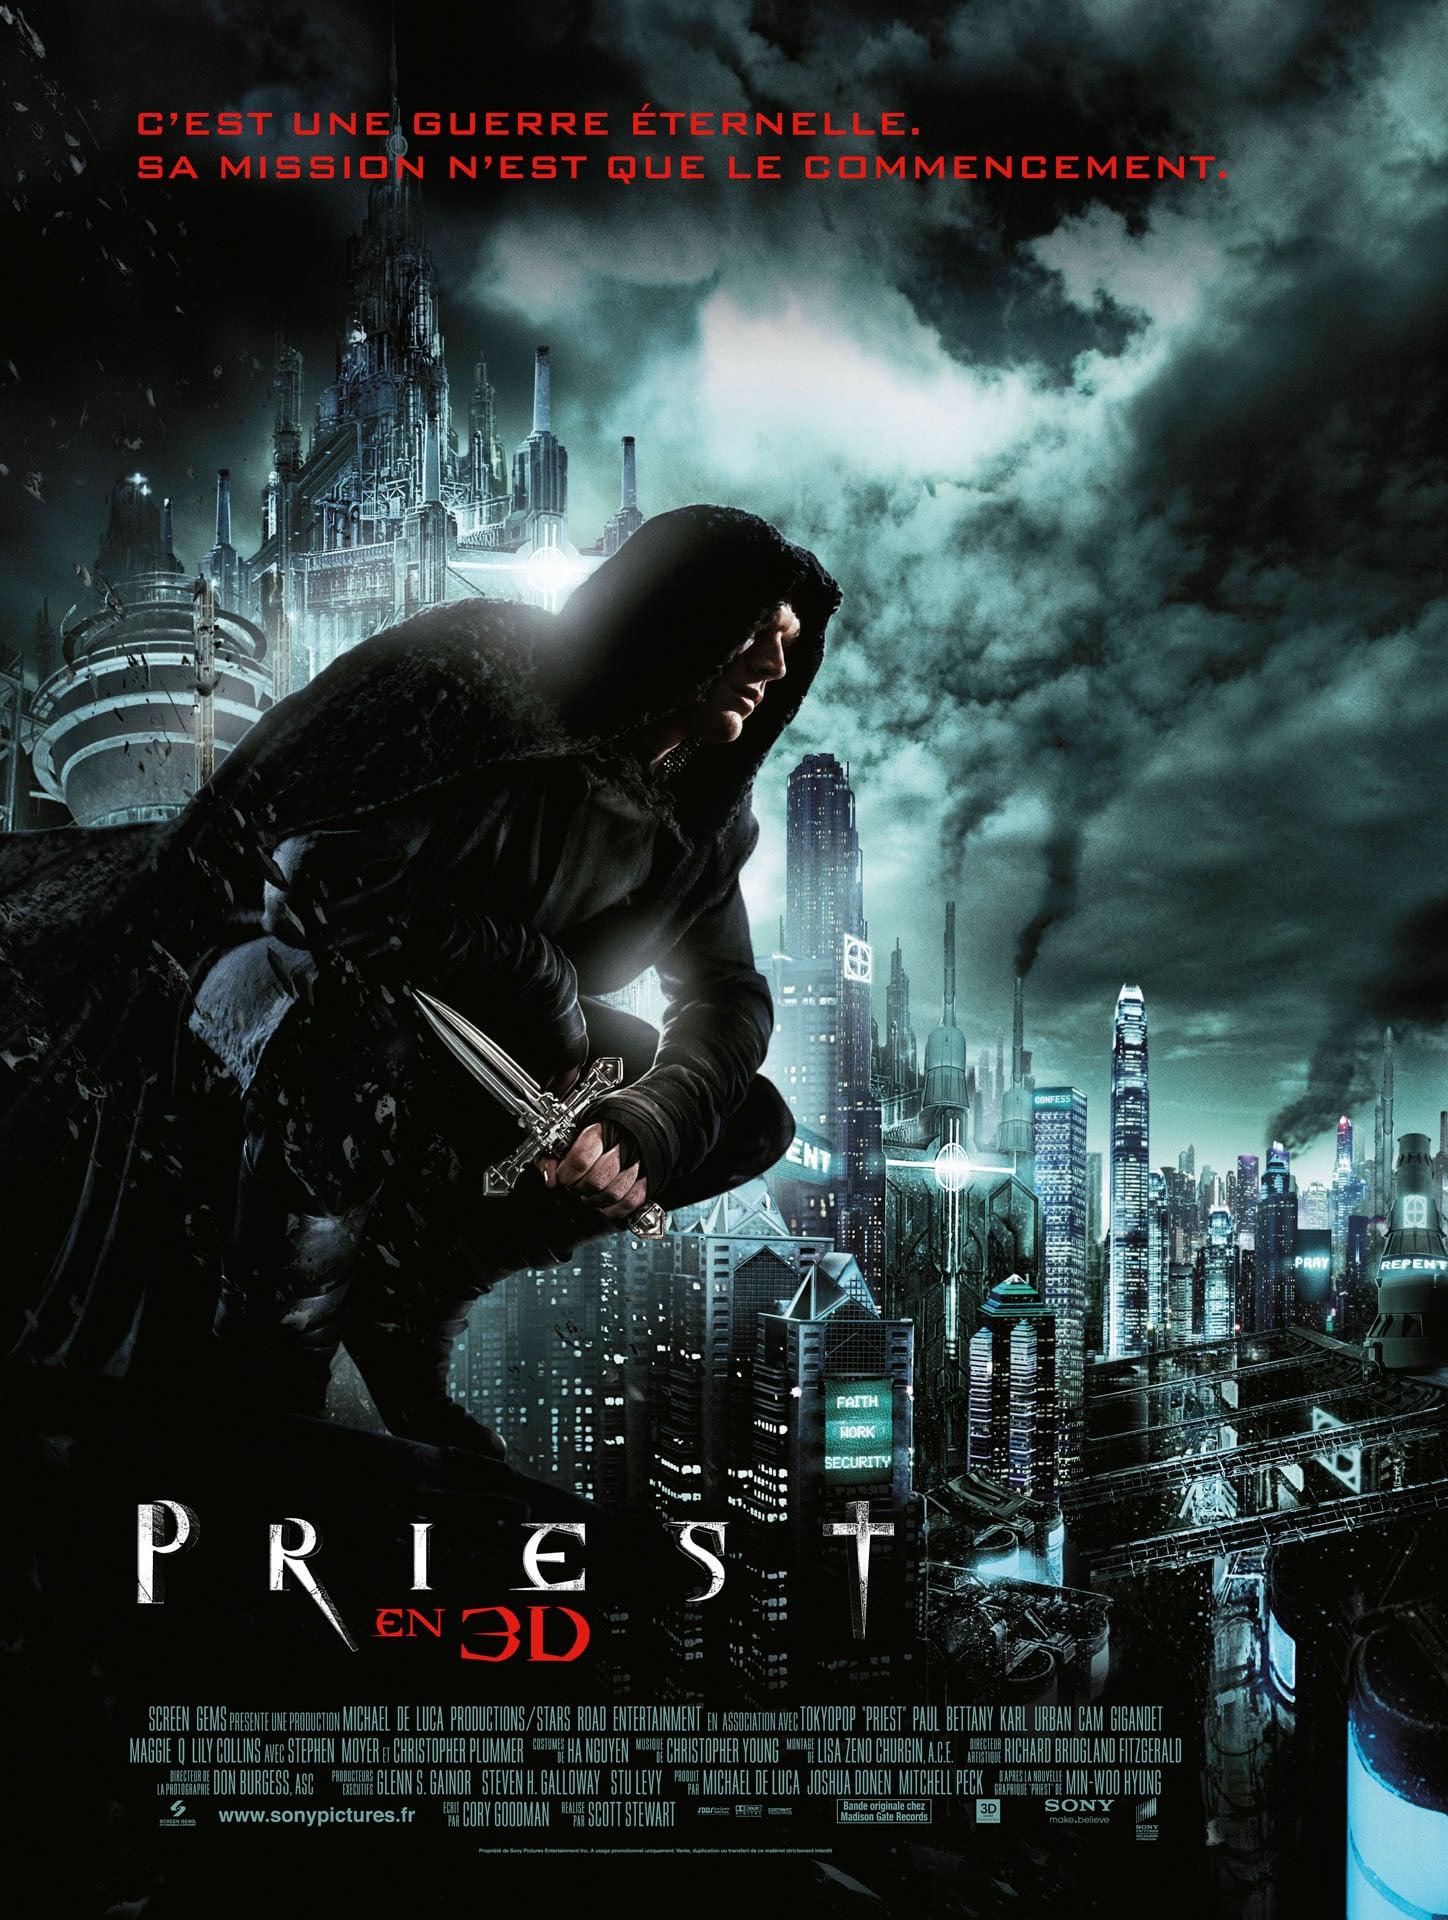 affiche du film Priest (2011)